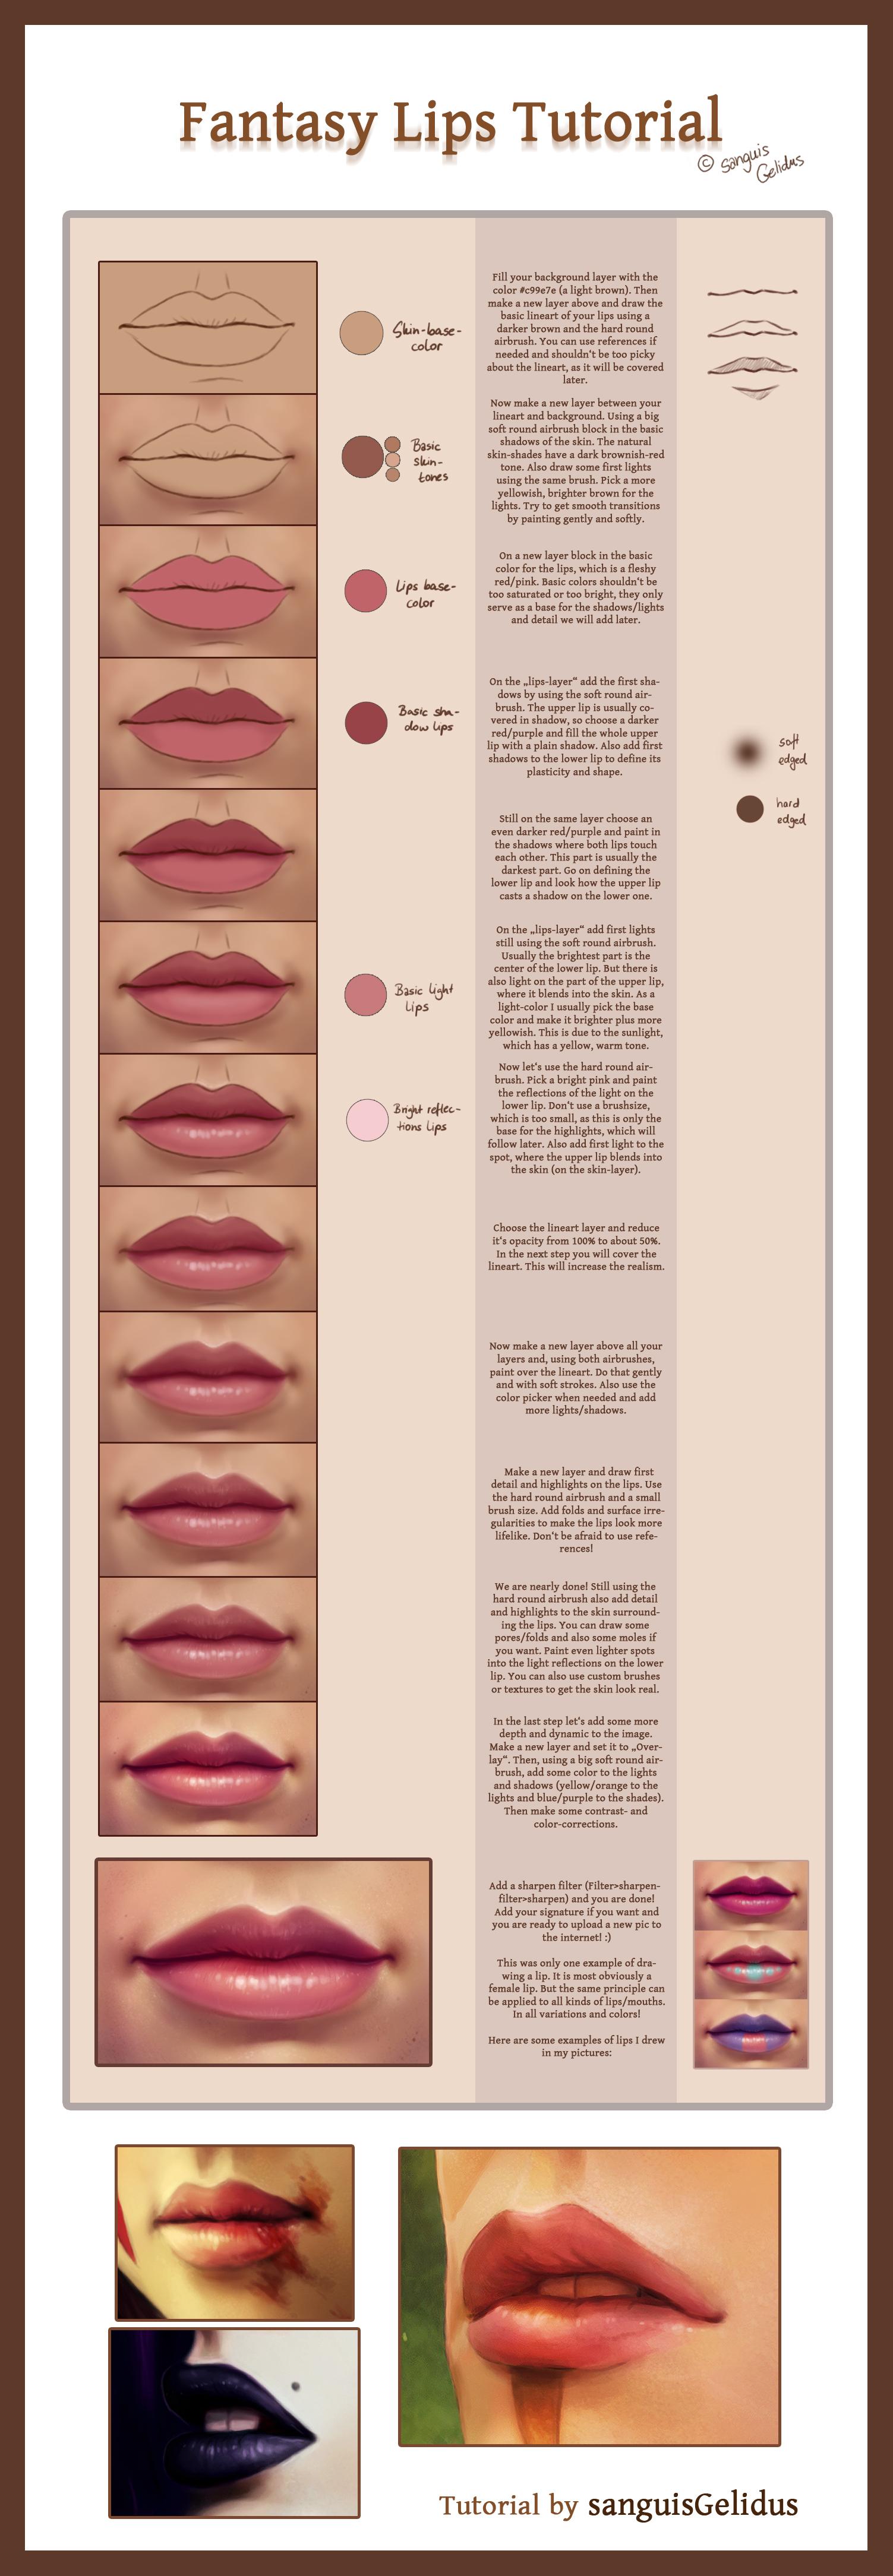 Fantasy Lips Tutorial by JoJoesArt